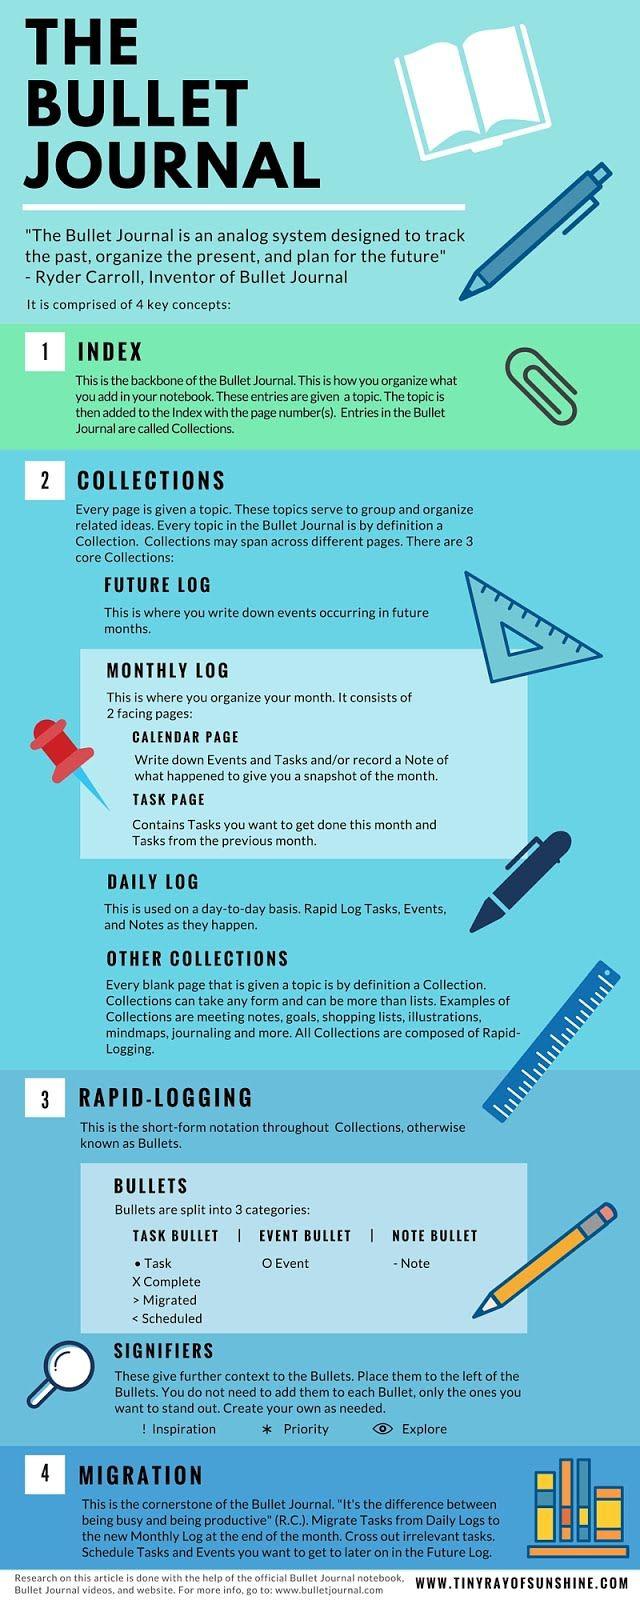 Bullet Journal infographic